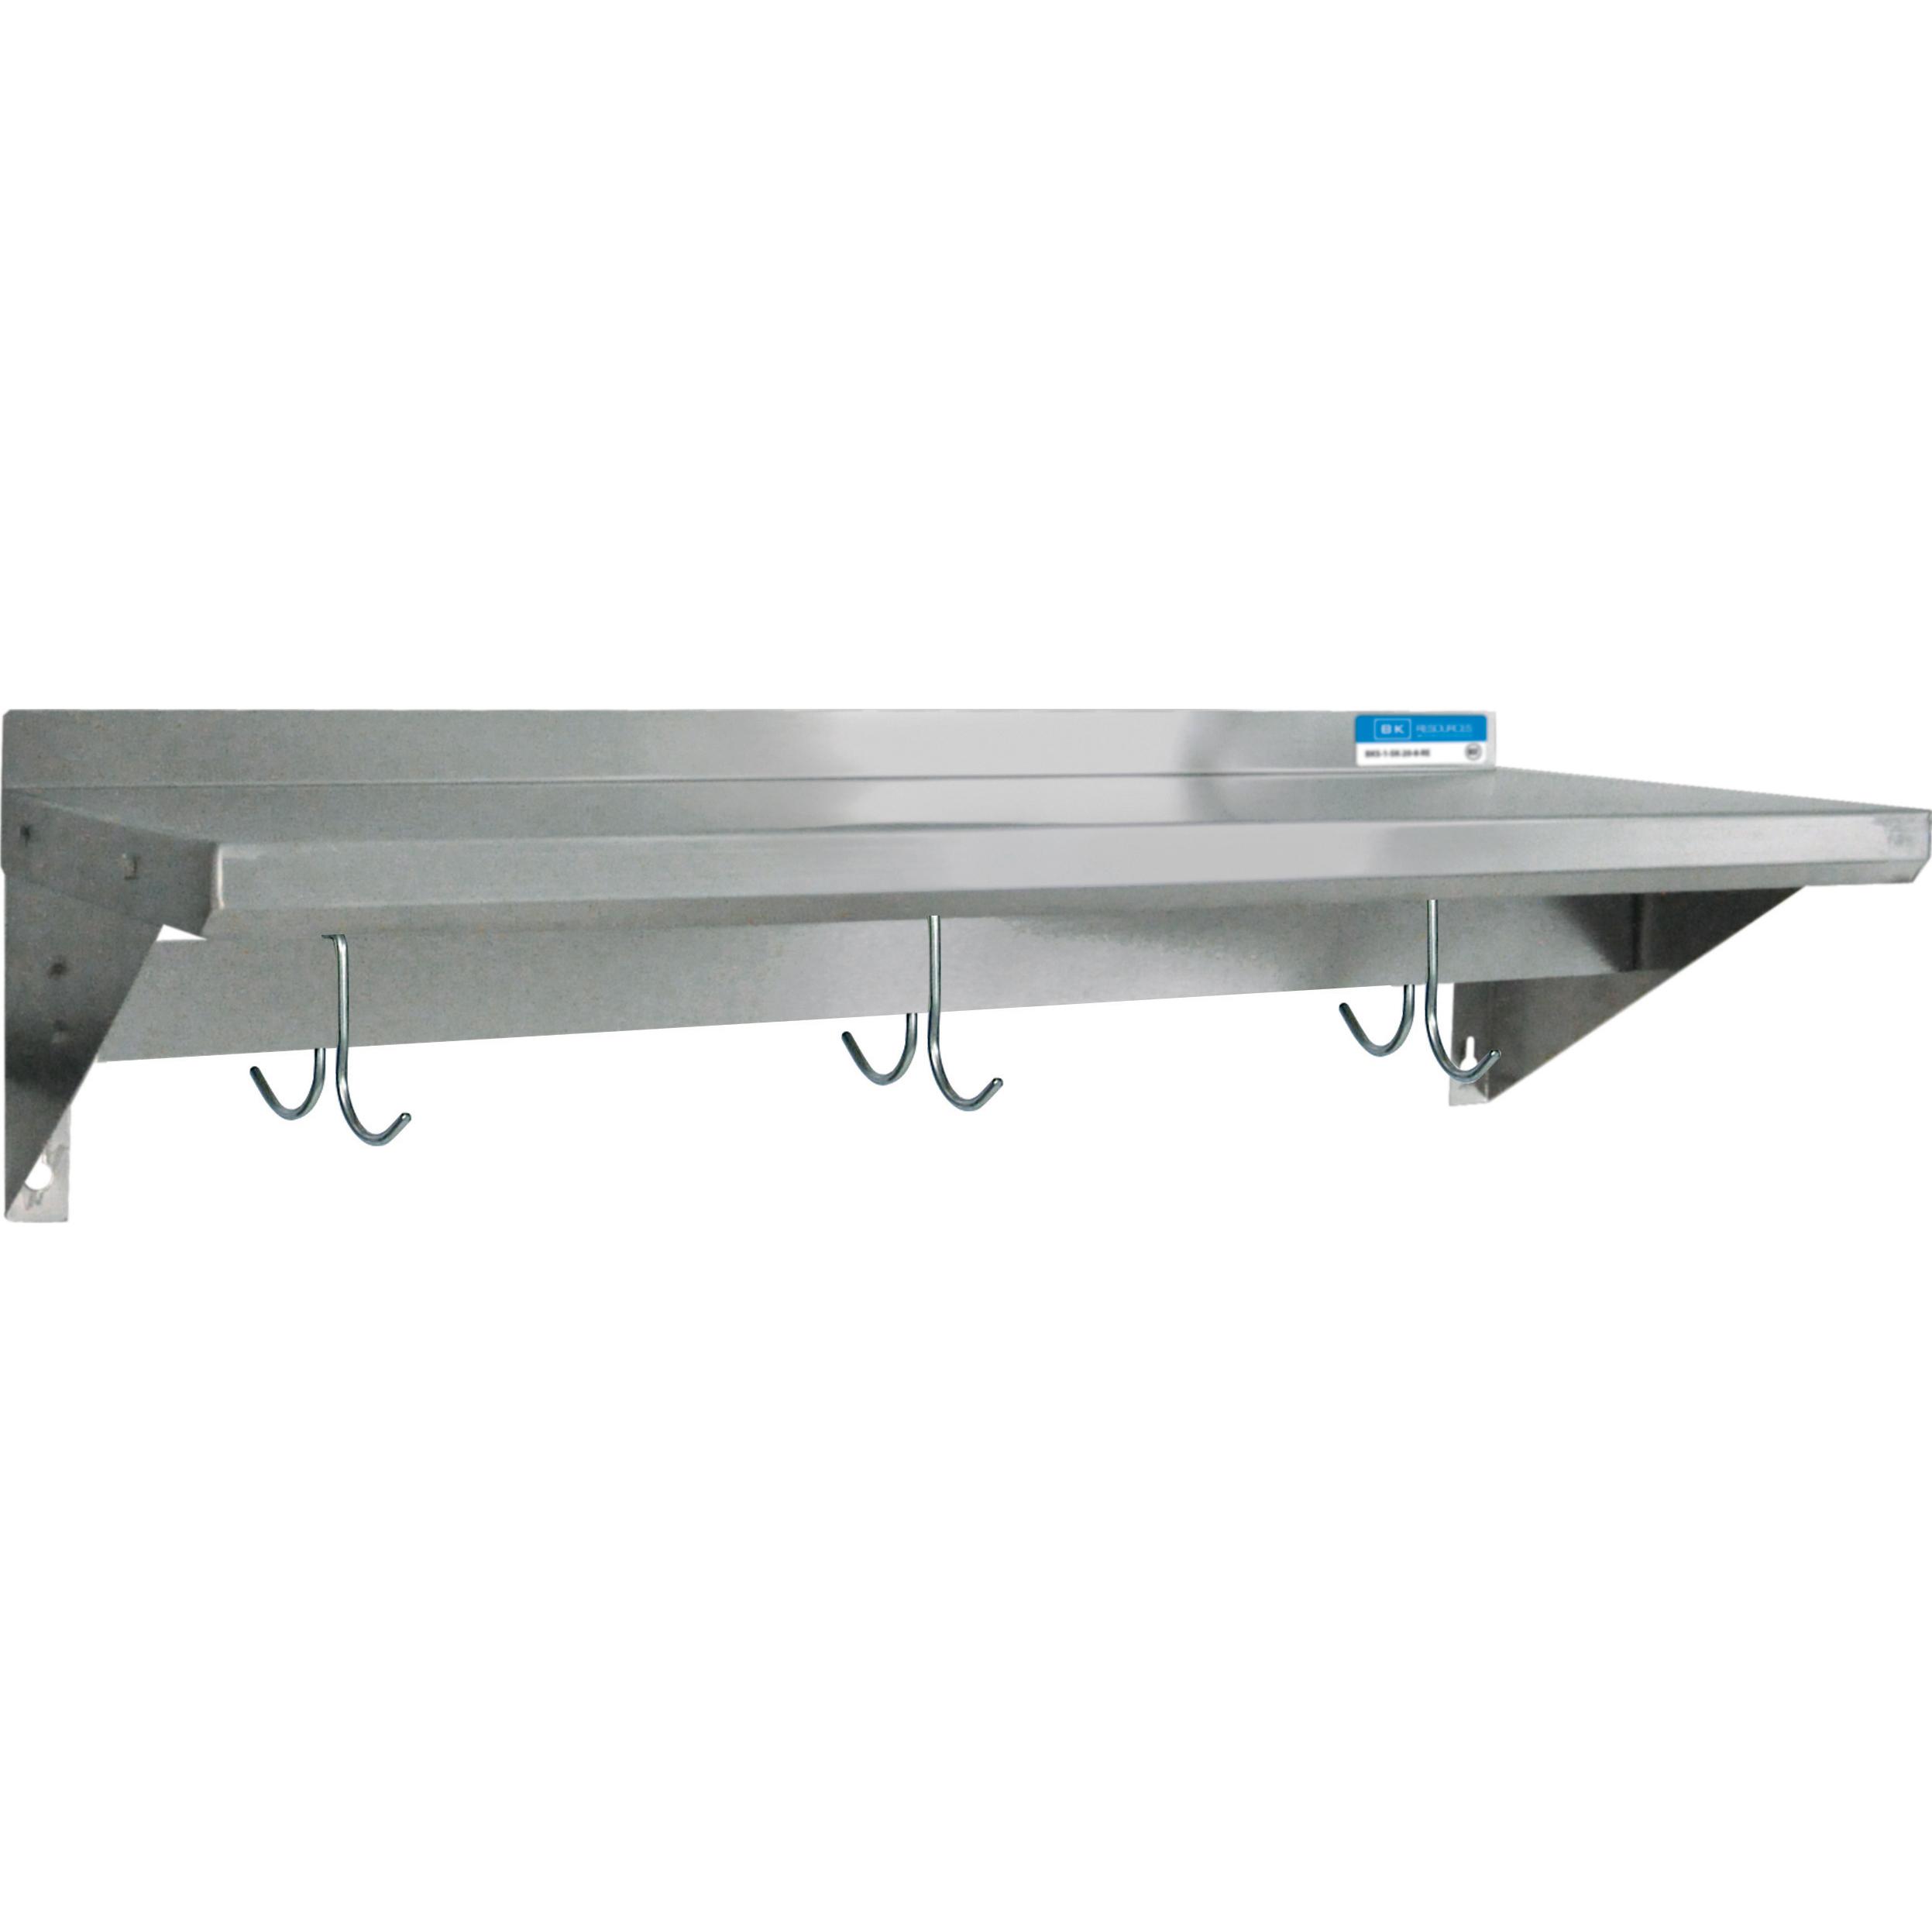 BK Resources BKWSE-1272-PR overshelf, wall-mounted with pot rack